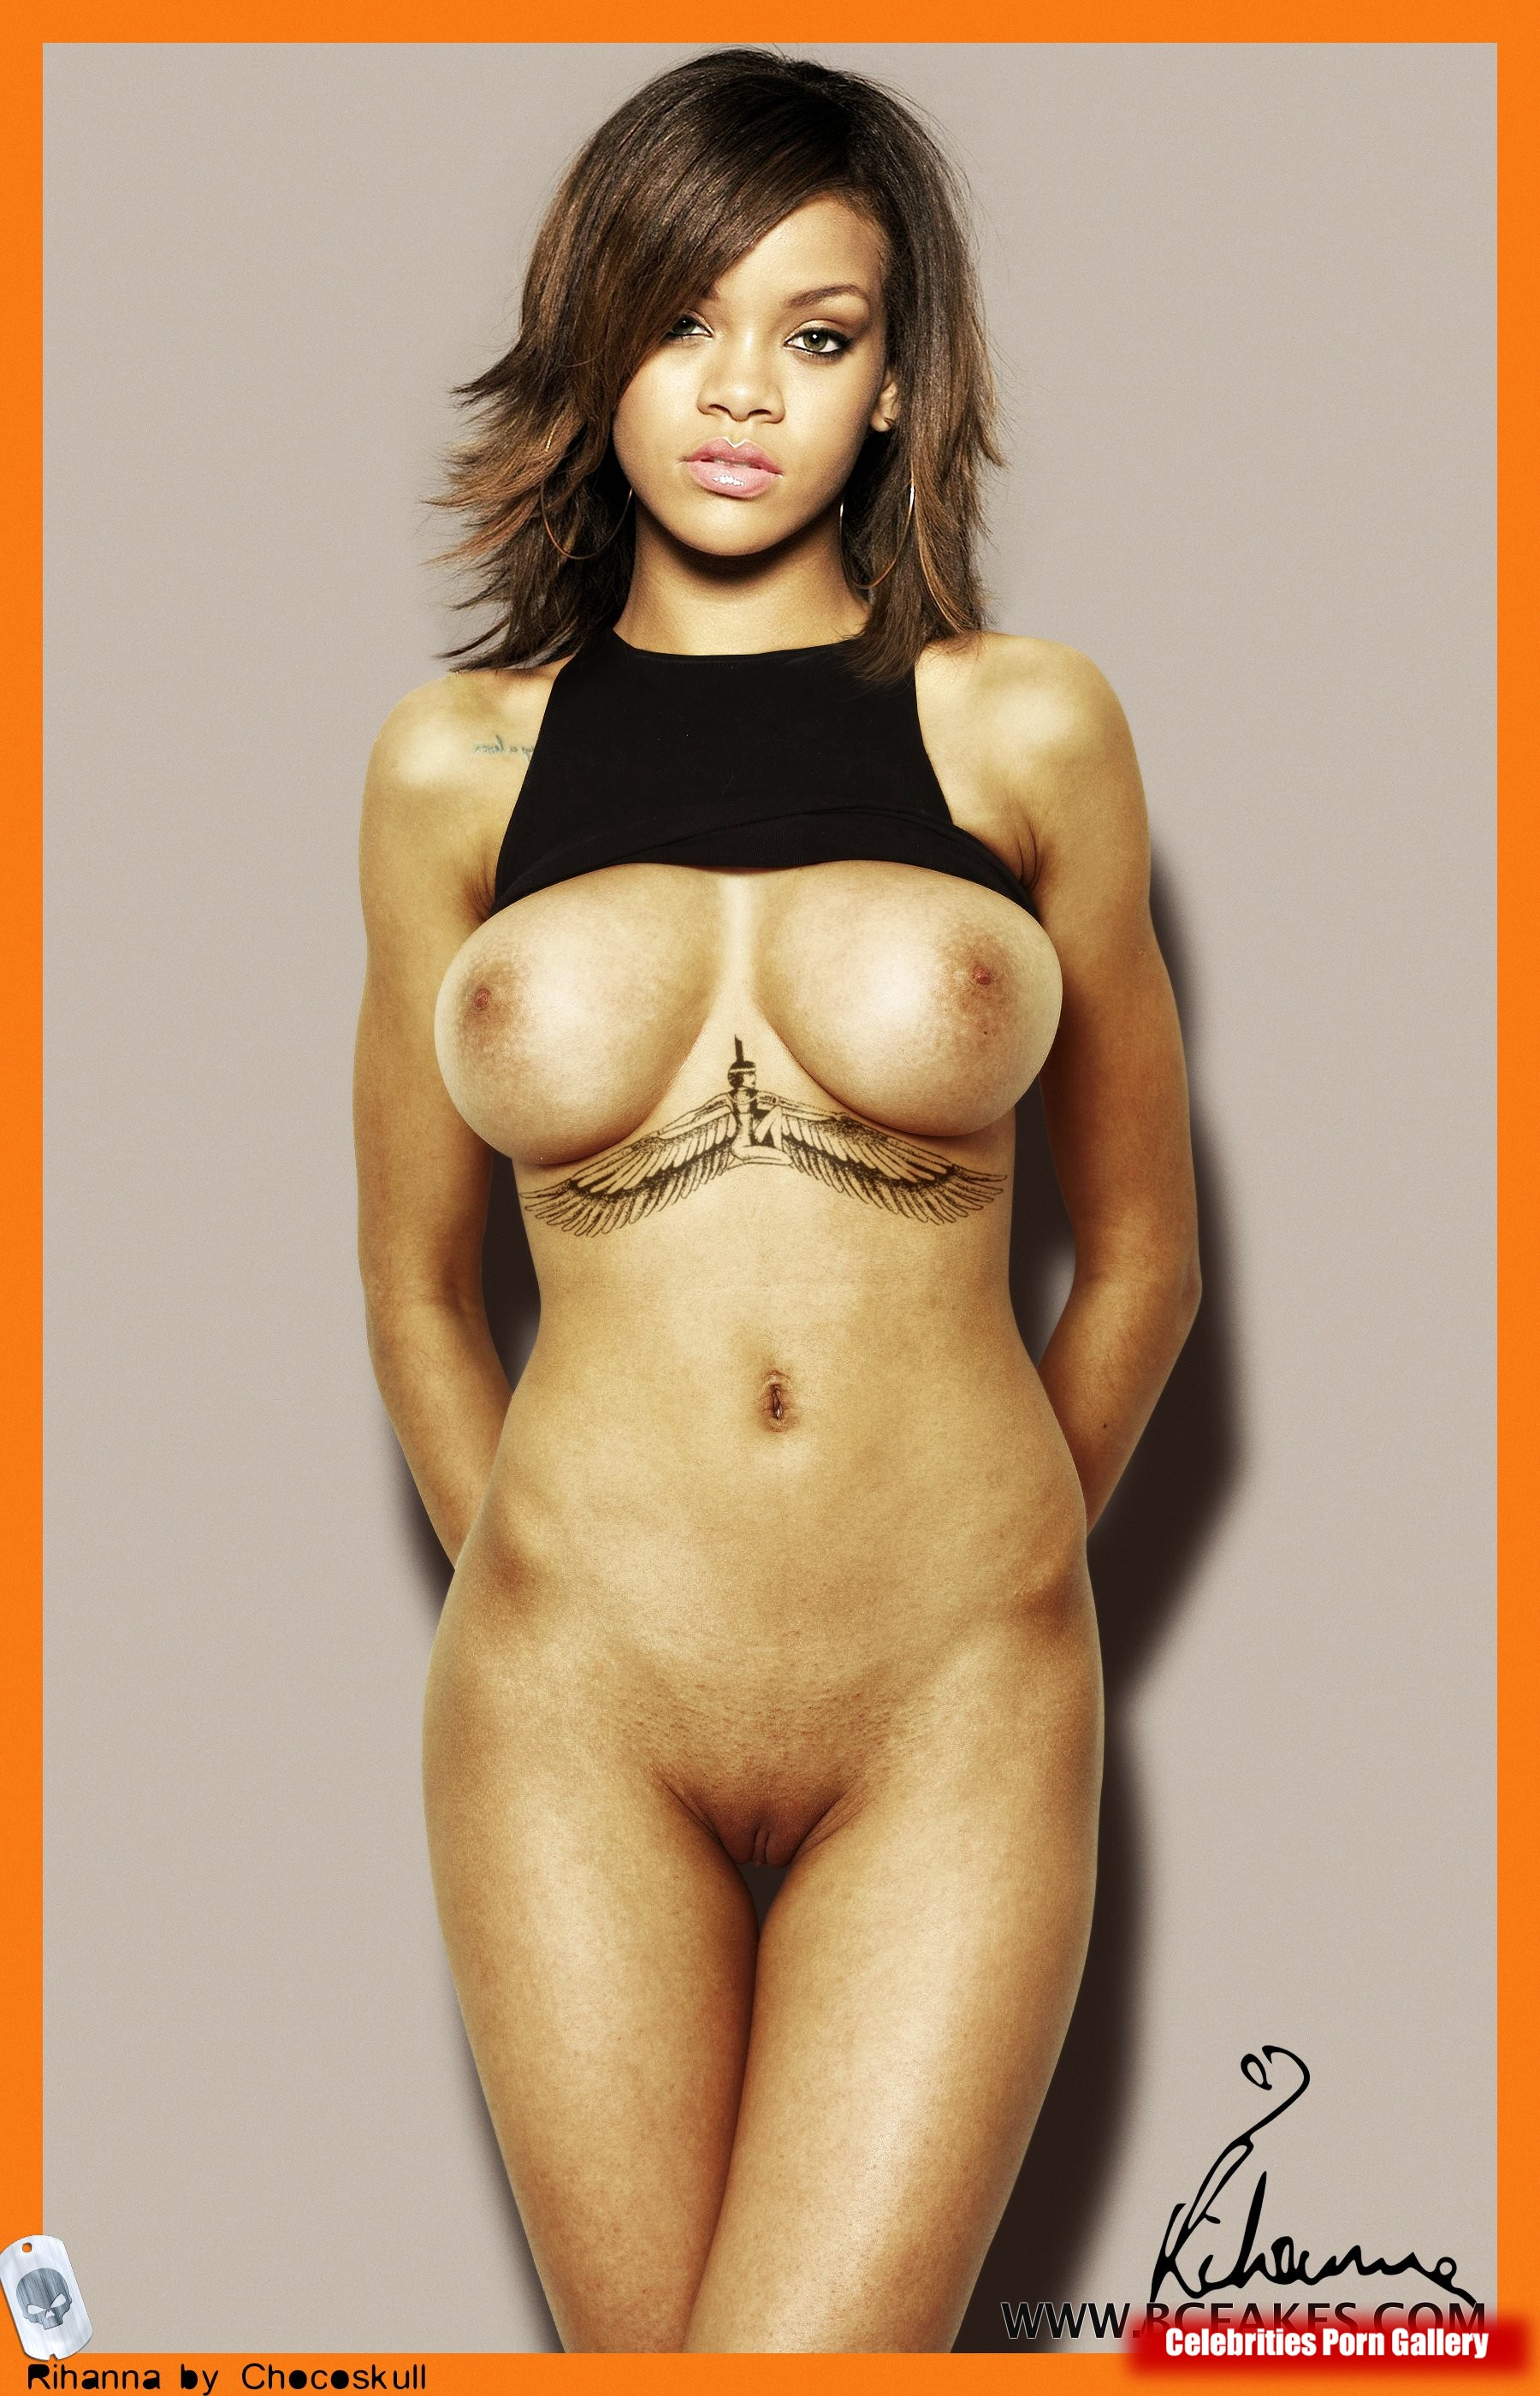 Rihanna Nudes Pics free nude celeb pics